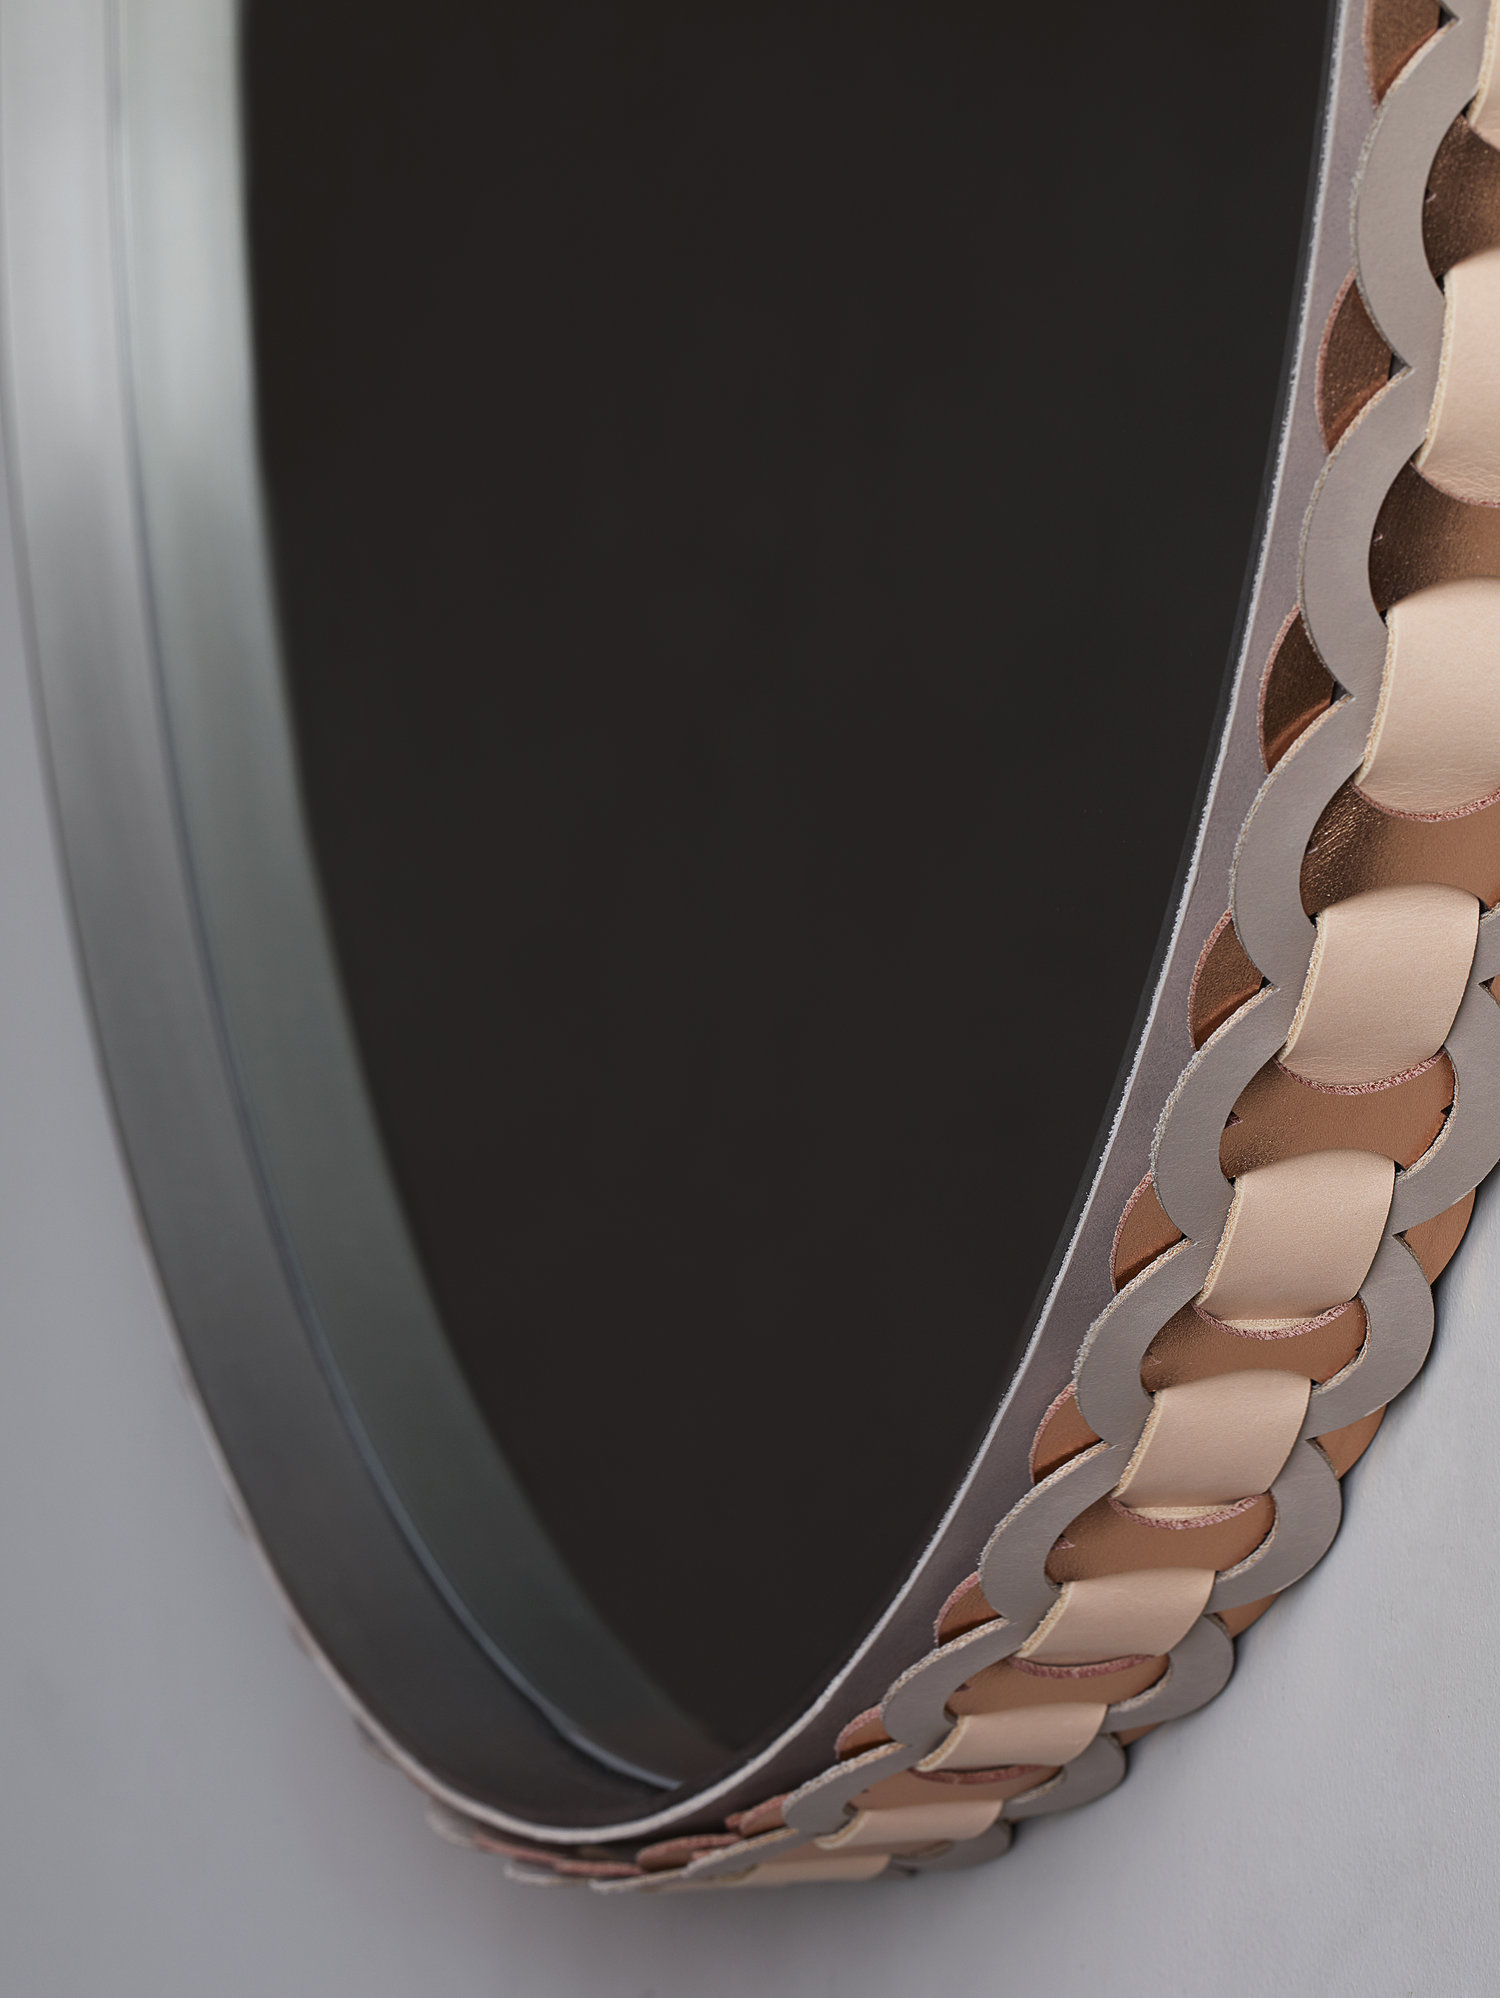 Strap pendant mirror detail